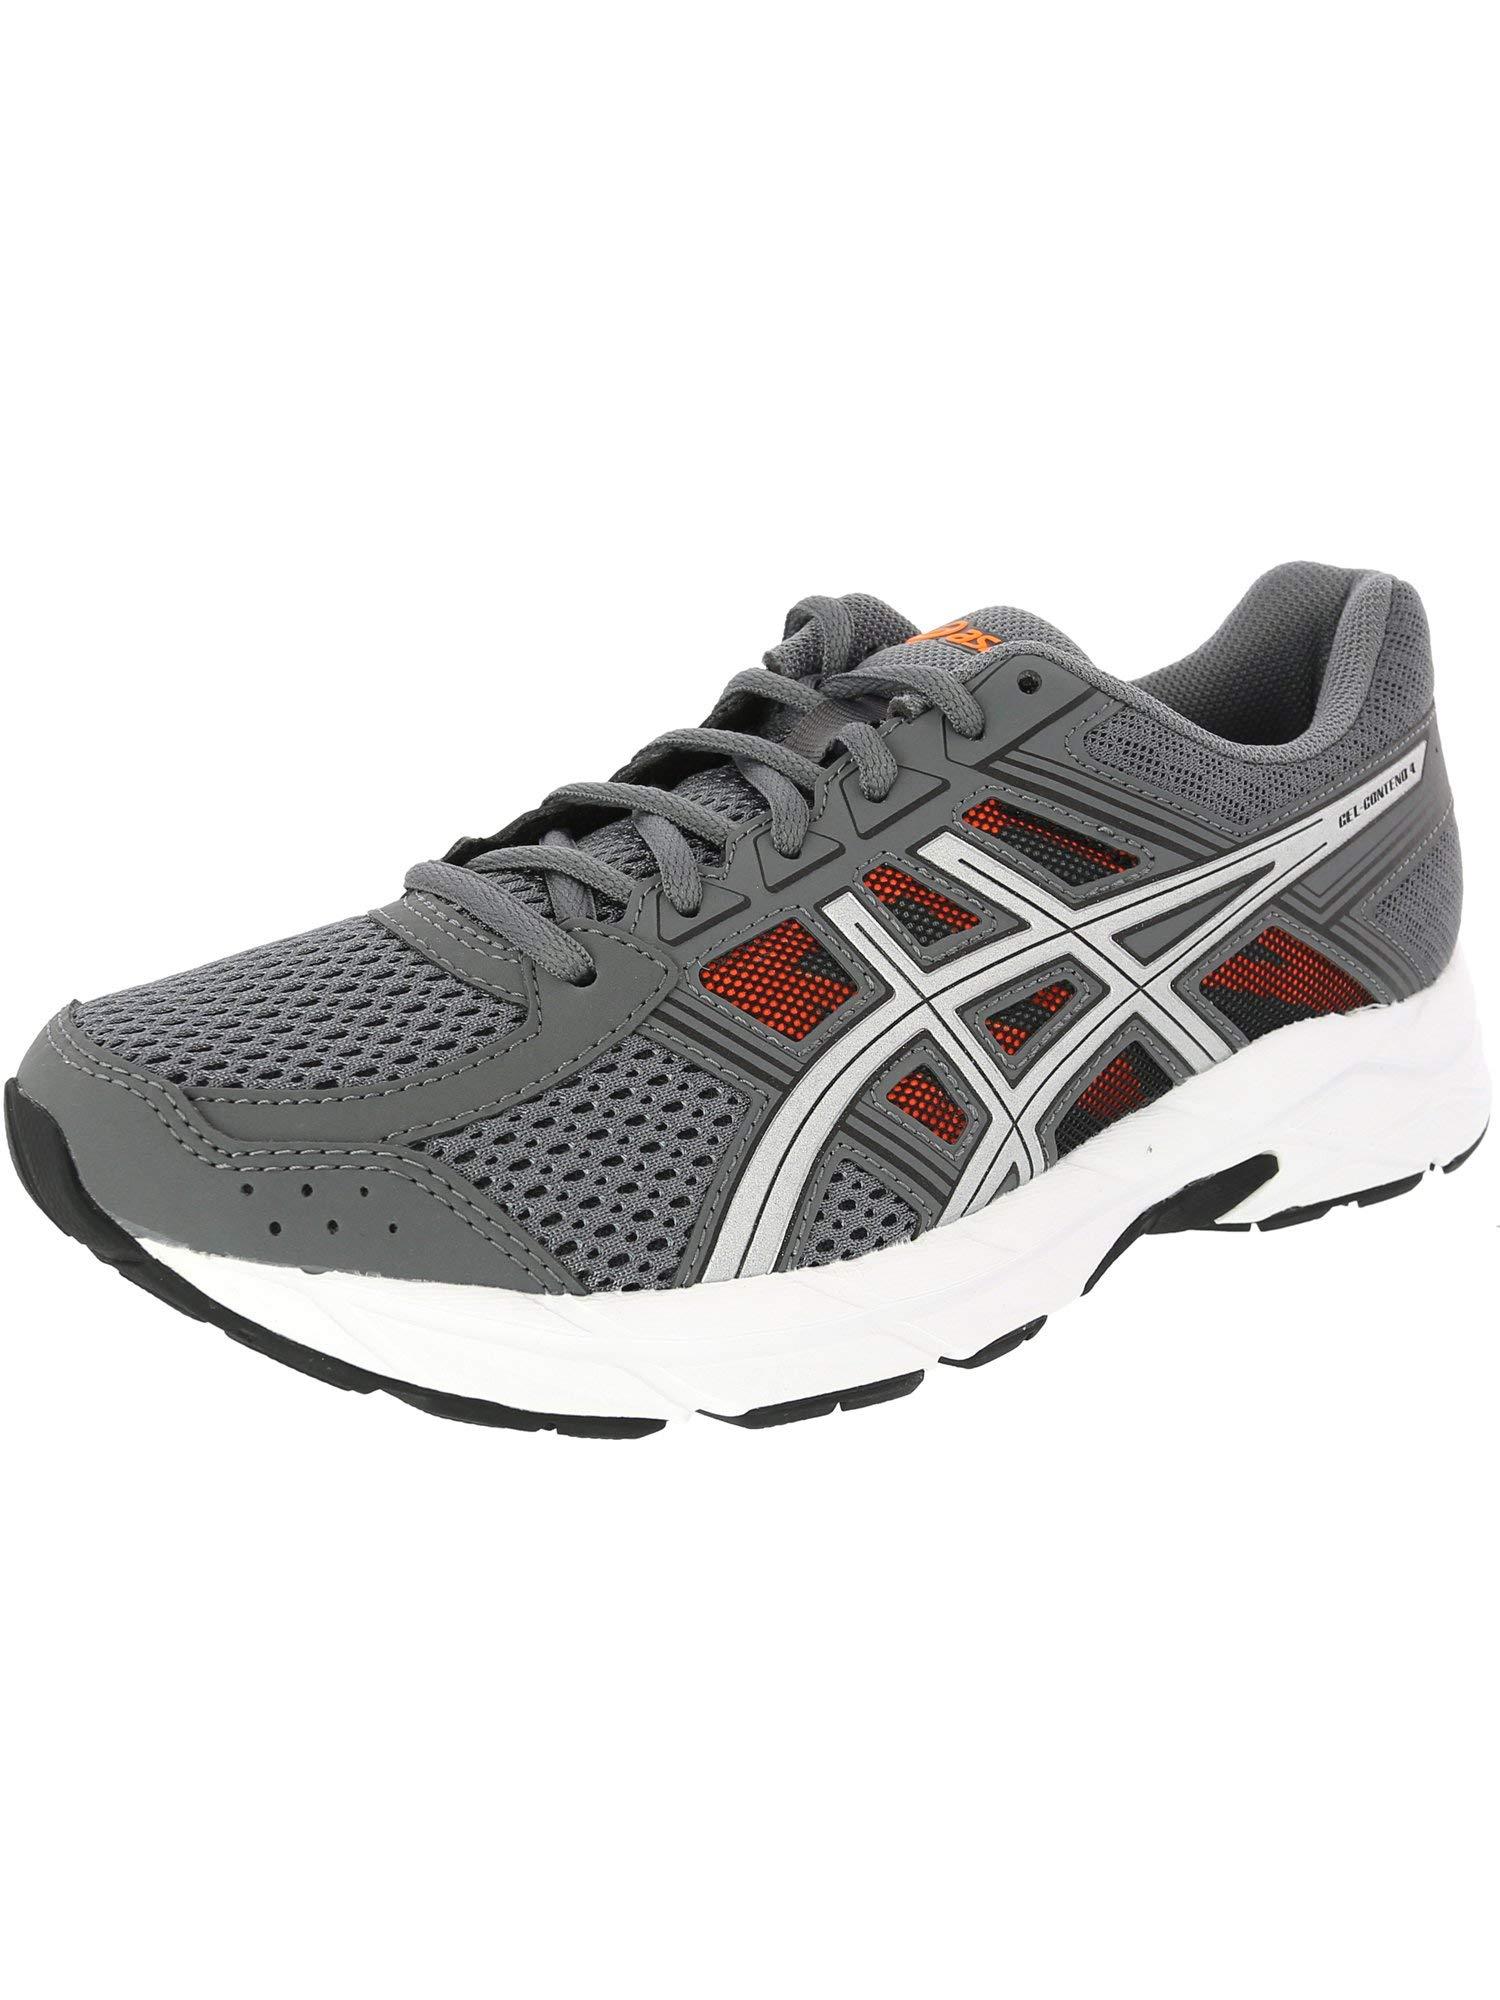 ASICS Men's Gel-Contend 4 Running Shoe Carbon/Silver/Orange, 8 D(M) US